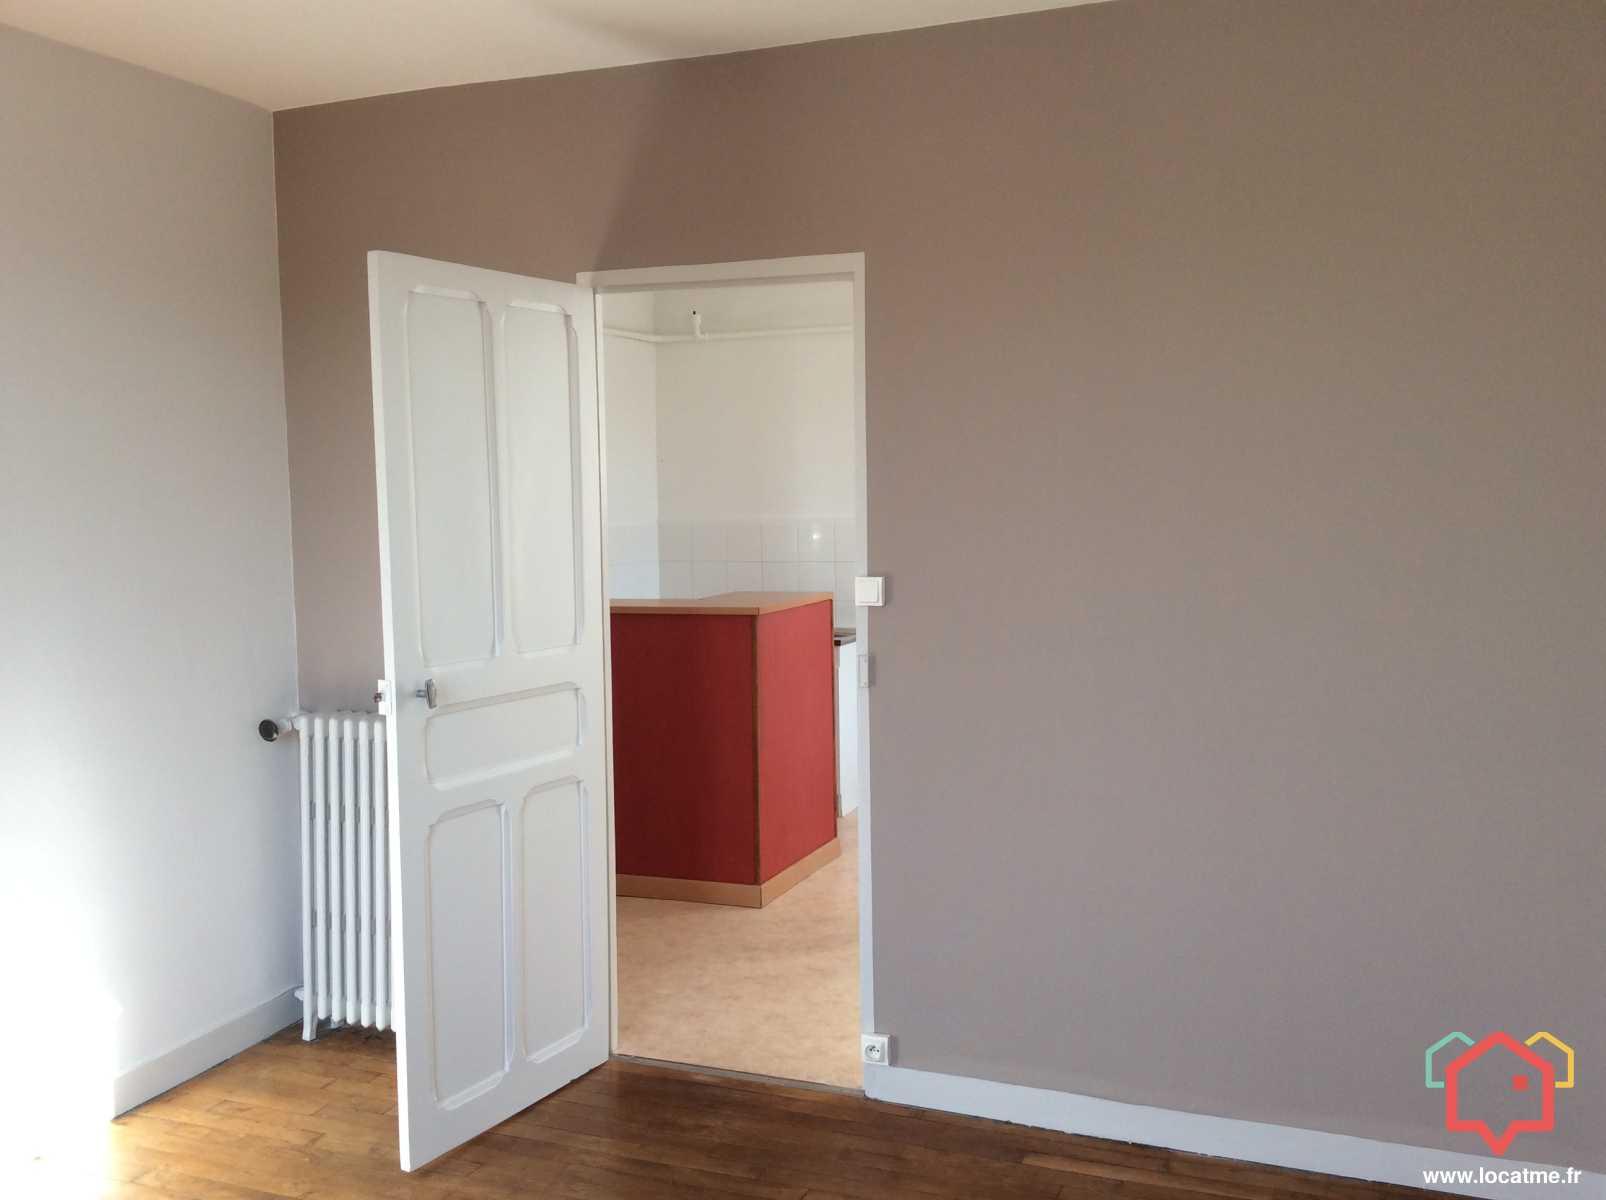 location appartement rennes sans frais d agence stunning. Black Bedroom Furniture Sets. Home Design Ideas